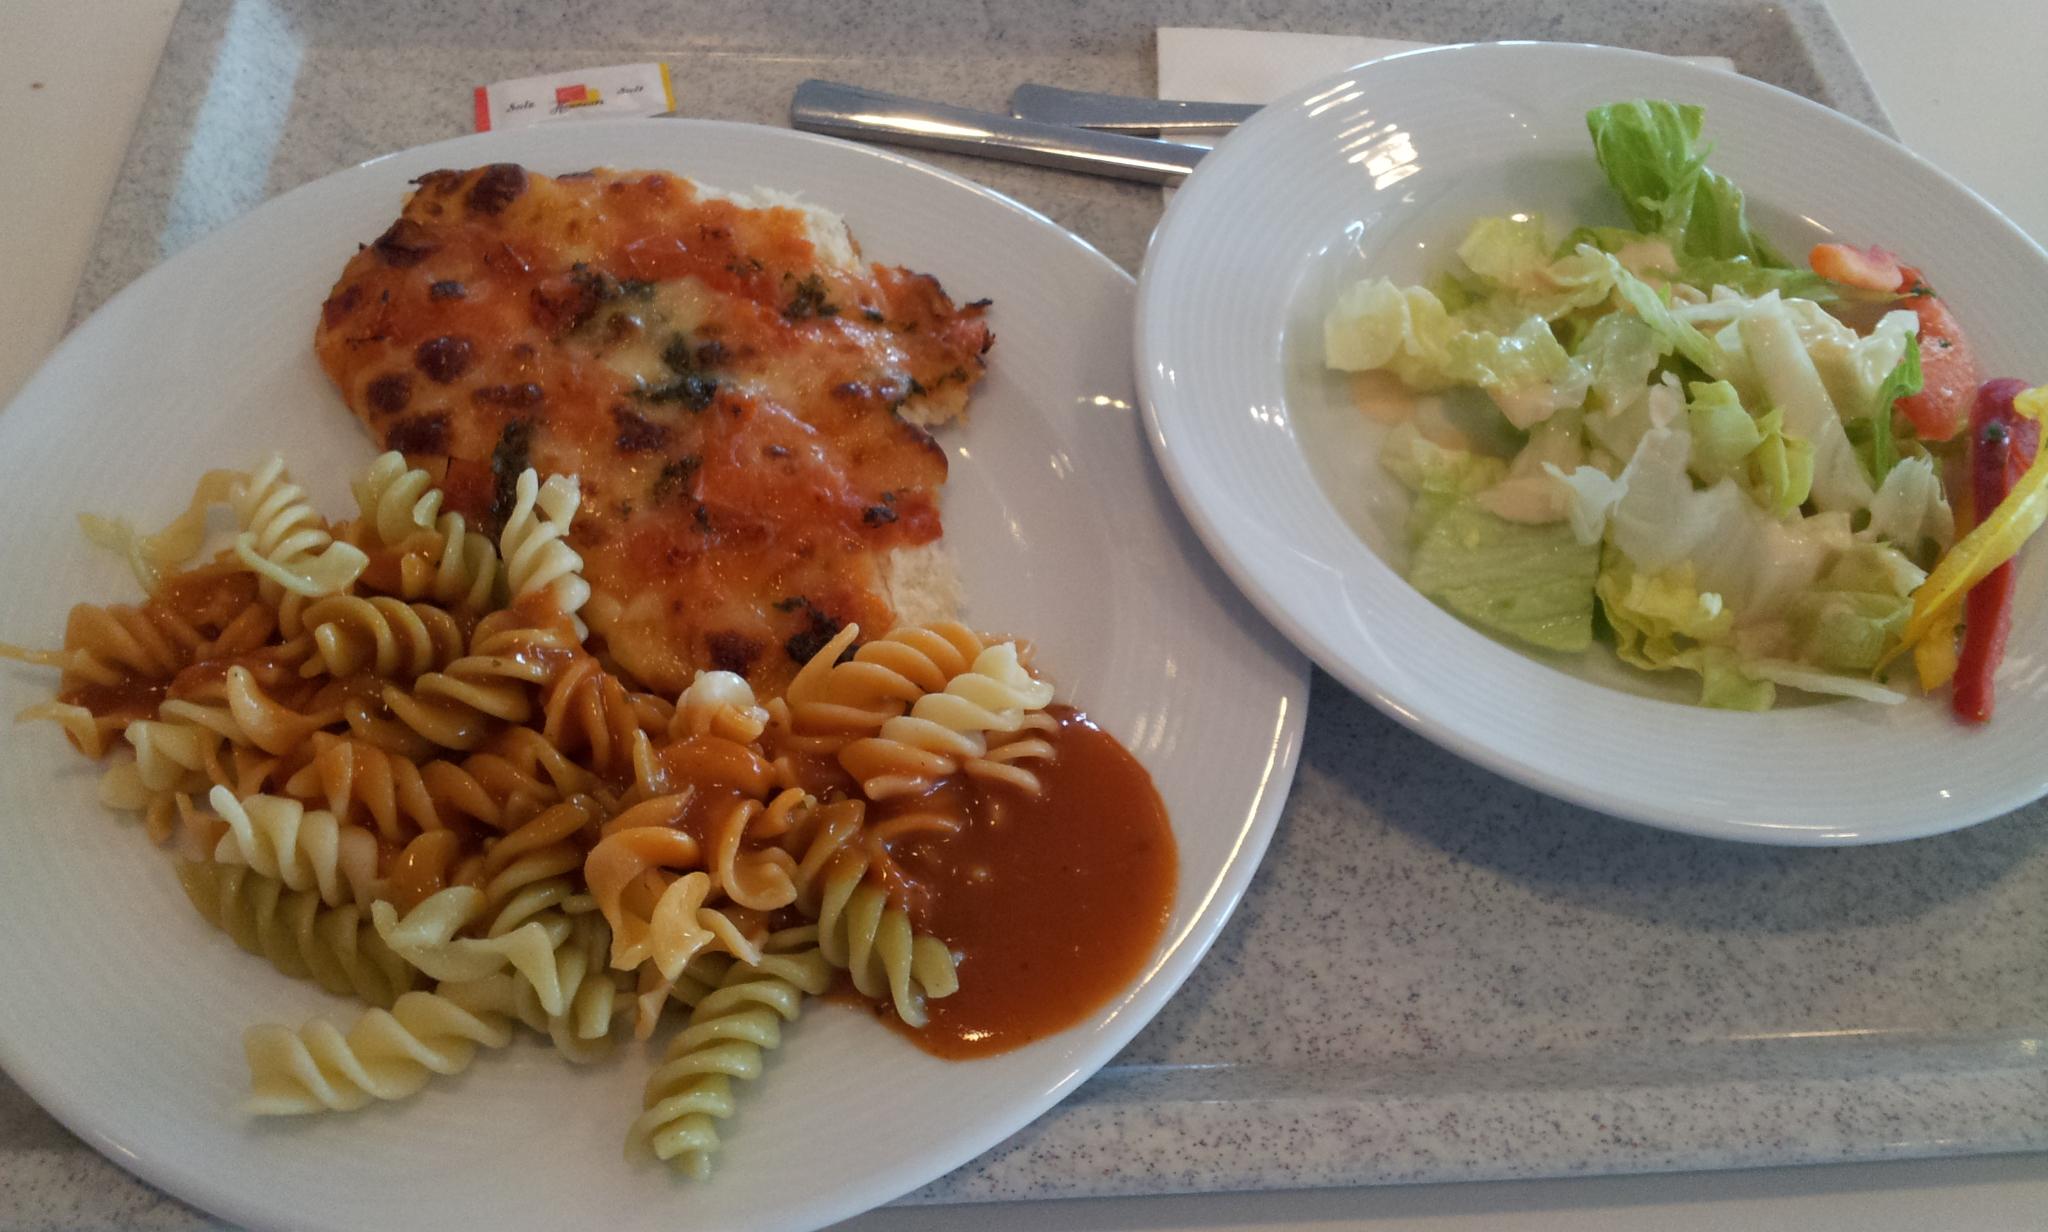 https://foodloader.net/Holz_2011-12-09_Nudeln_mit_Pizza_und_Salat.jpg